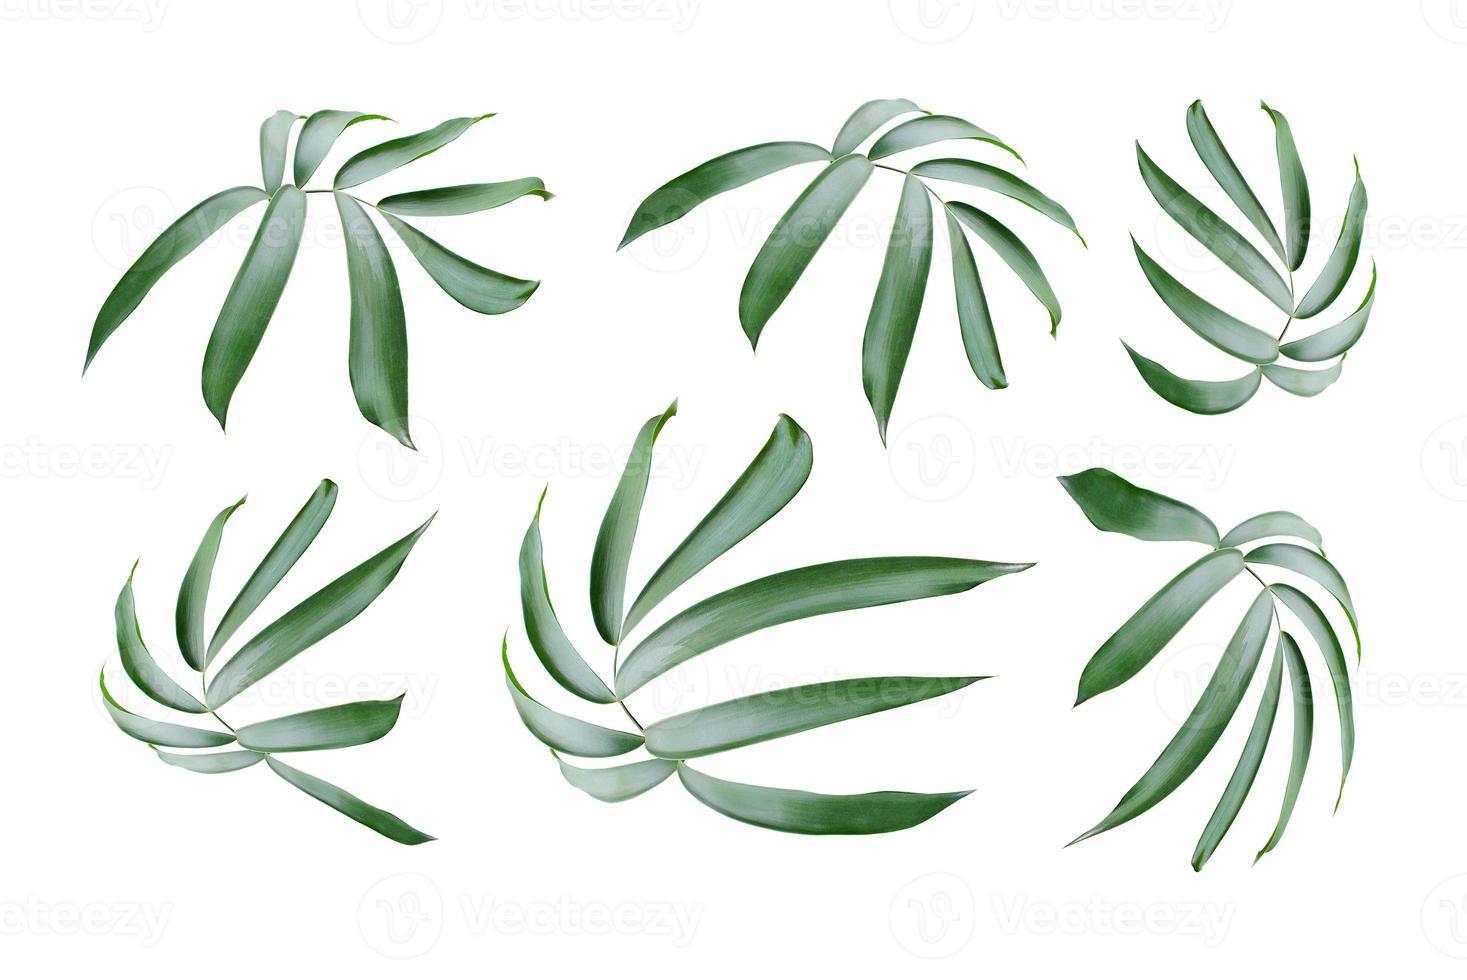 foglie verdi isolati su sfondo bianco foto